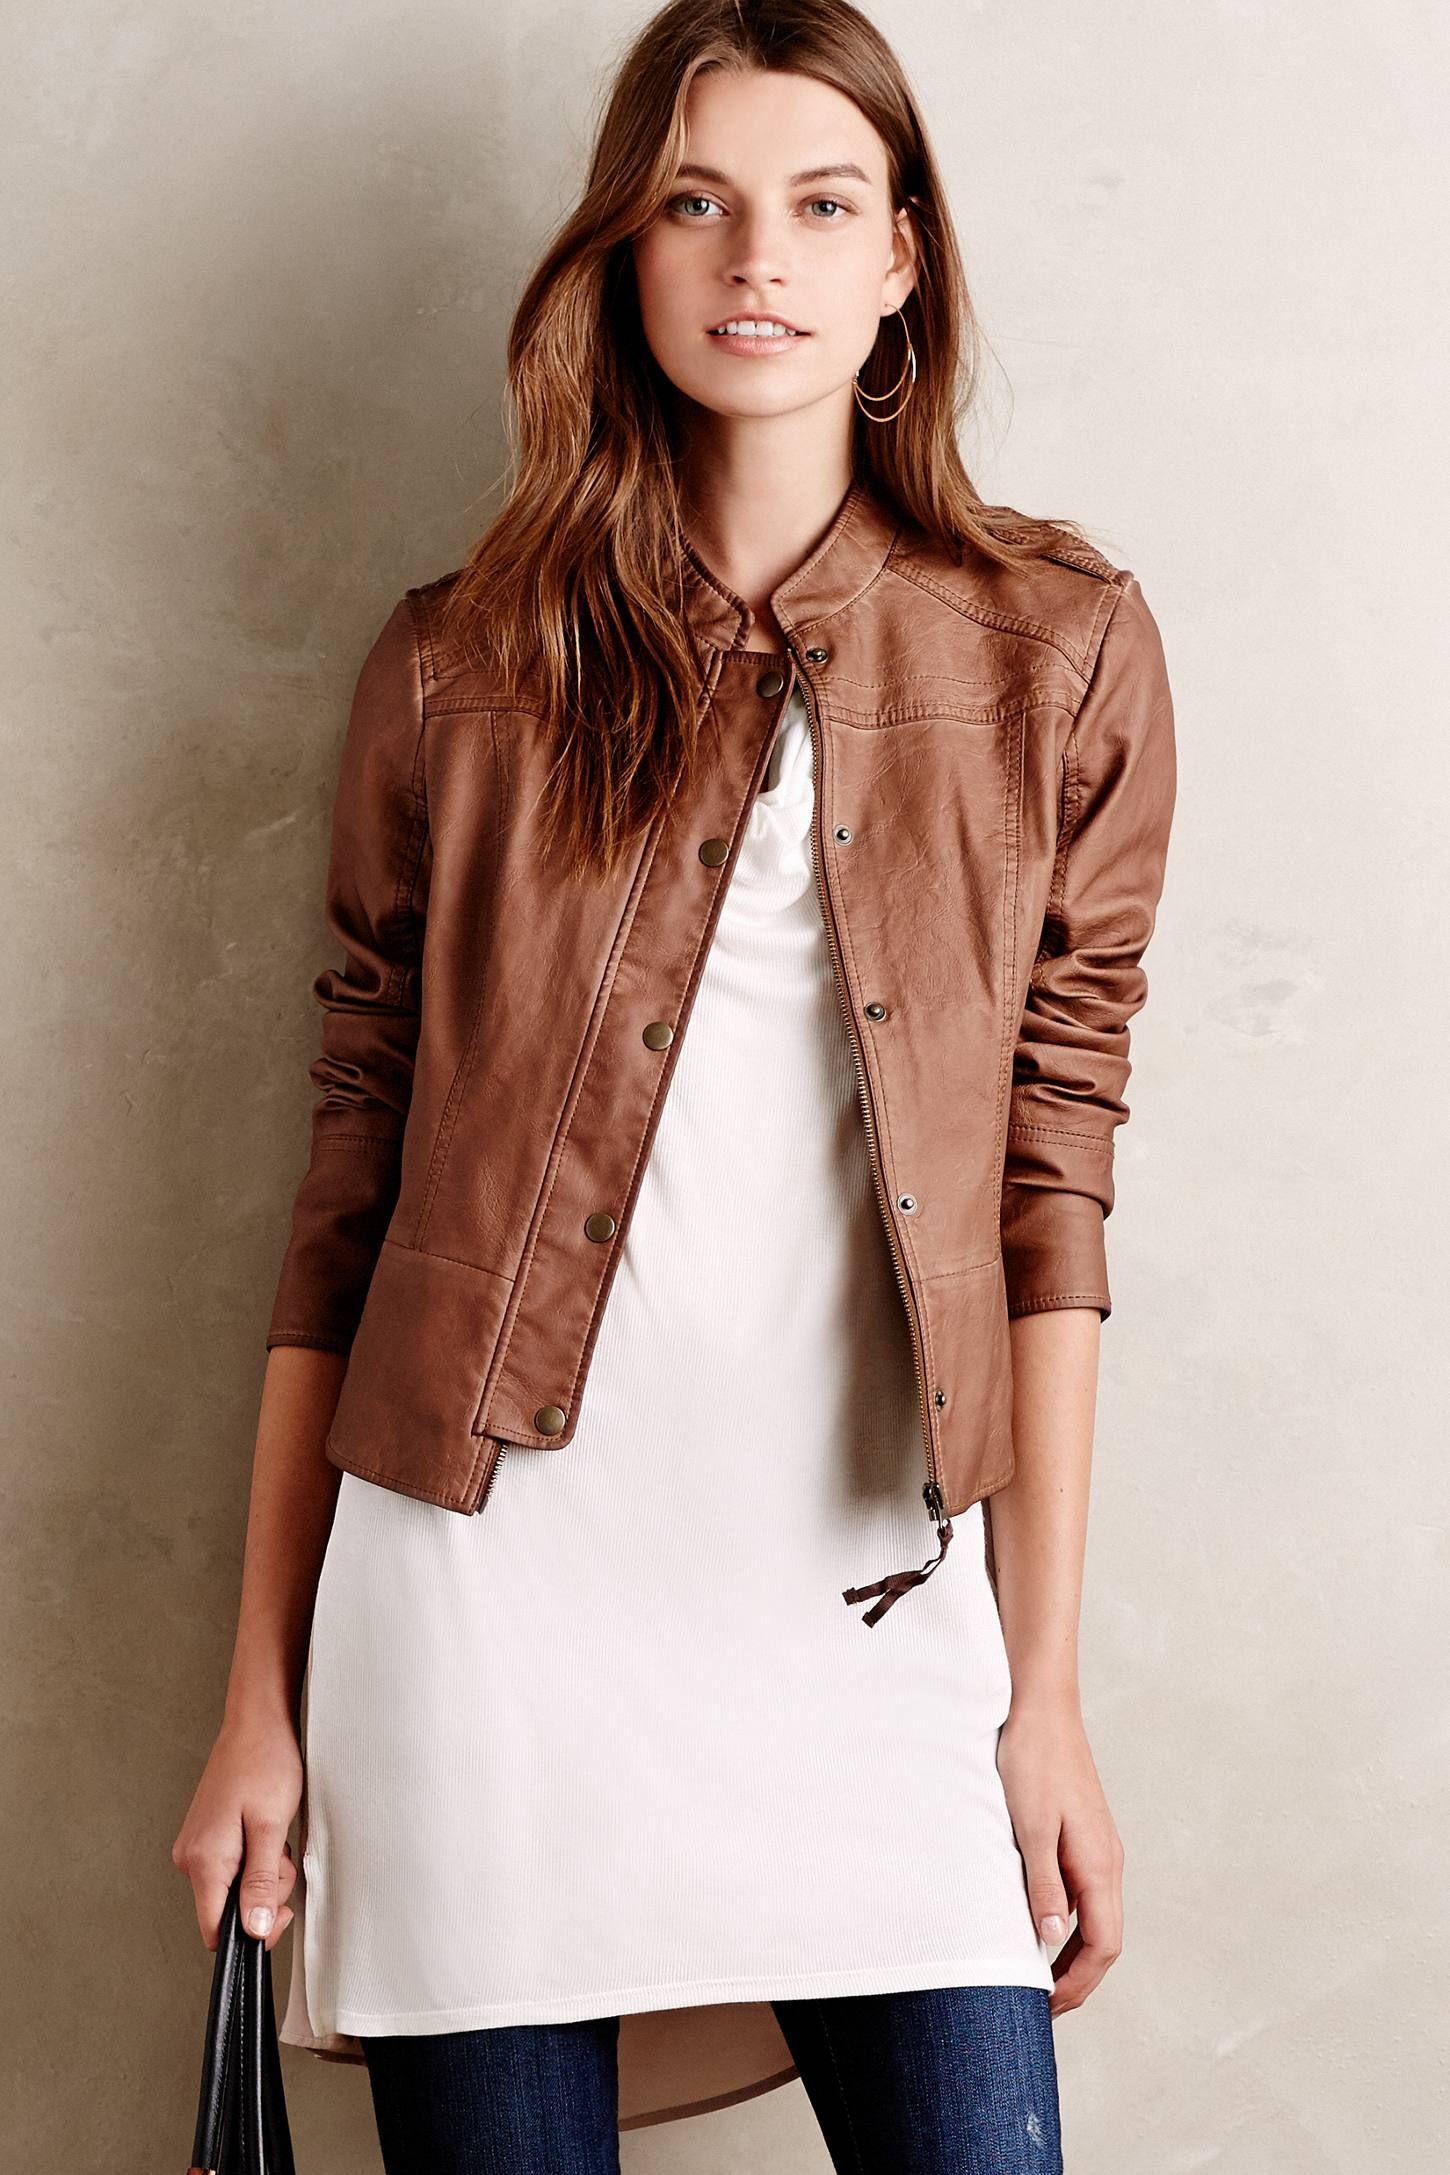 Vegan Leather Bomber Vegan clothing, Clothes, Leather jacket